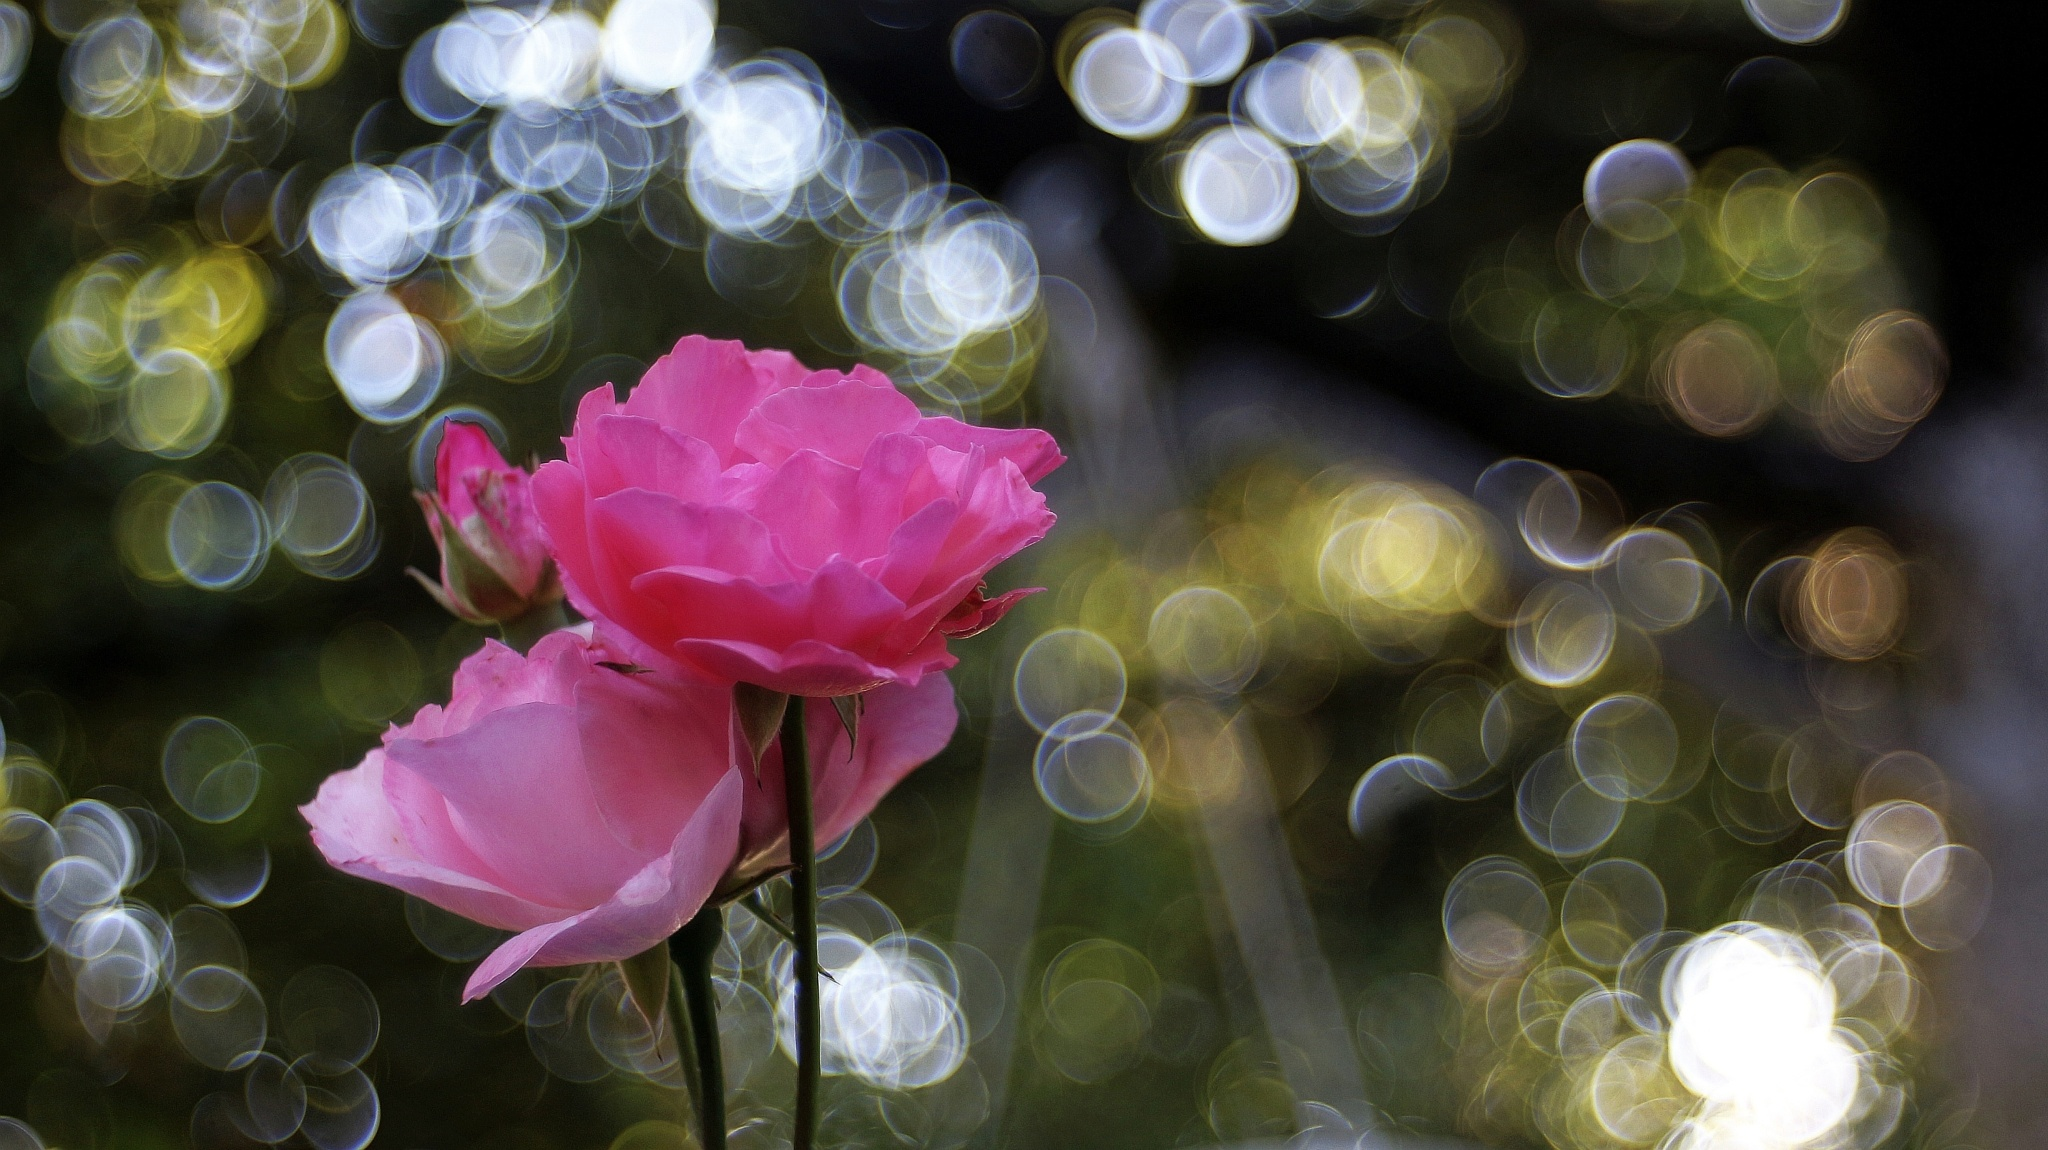 Roses by nikica